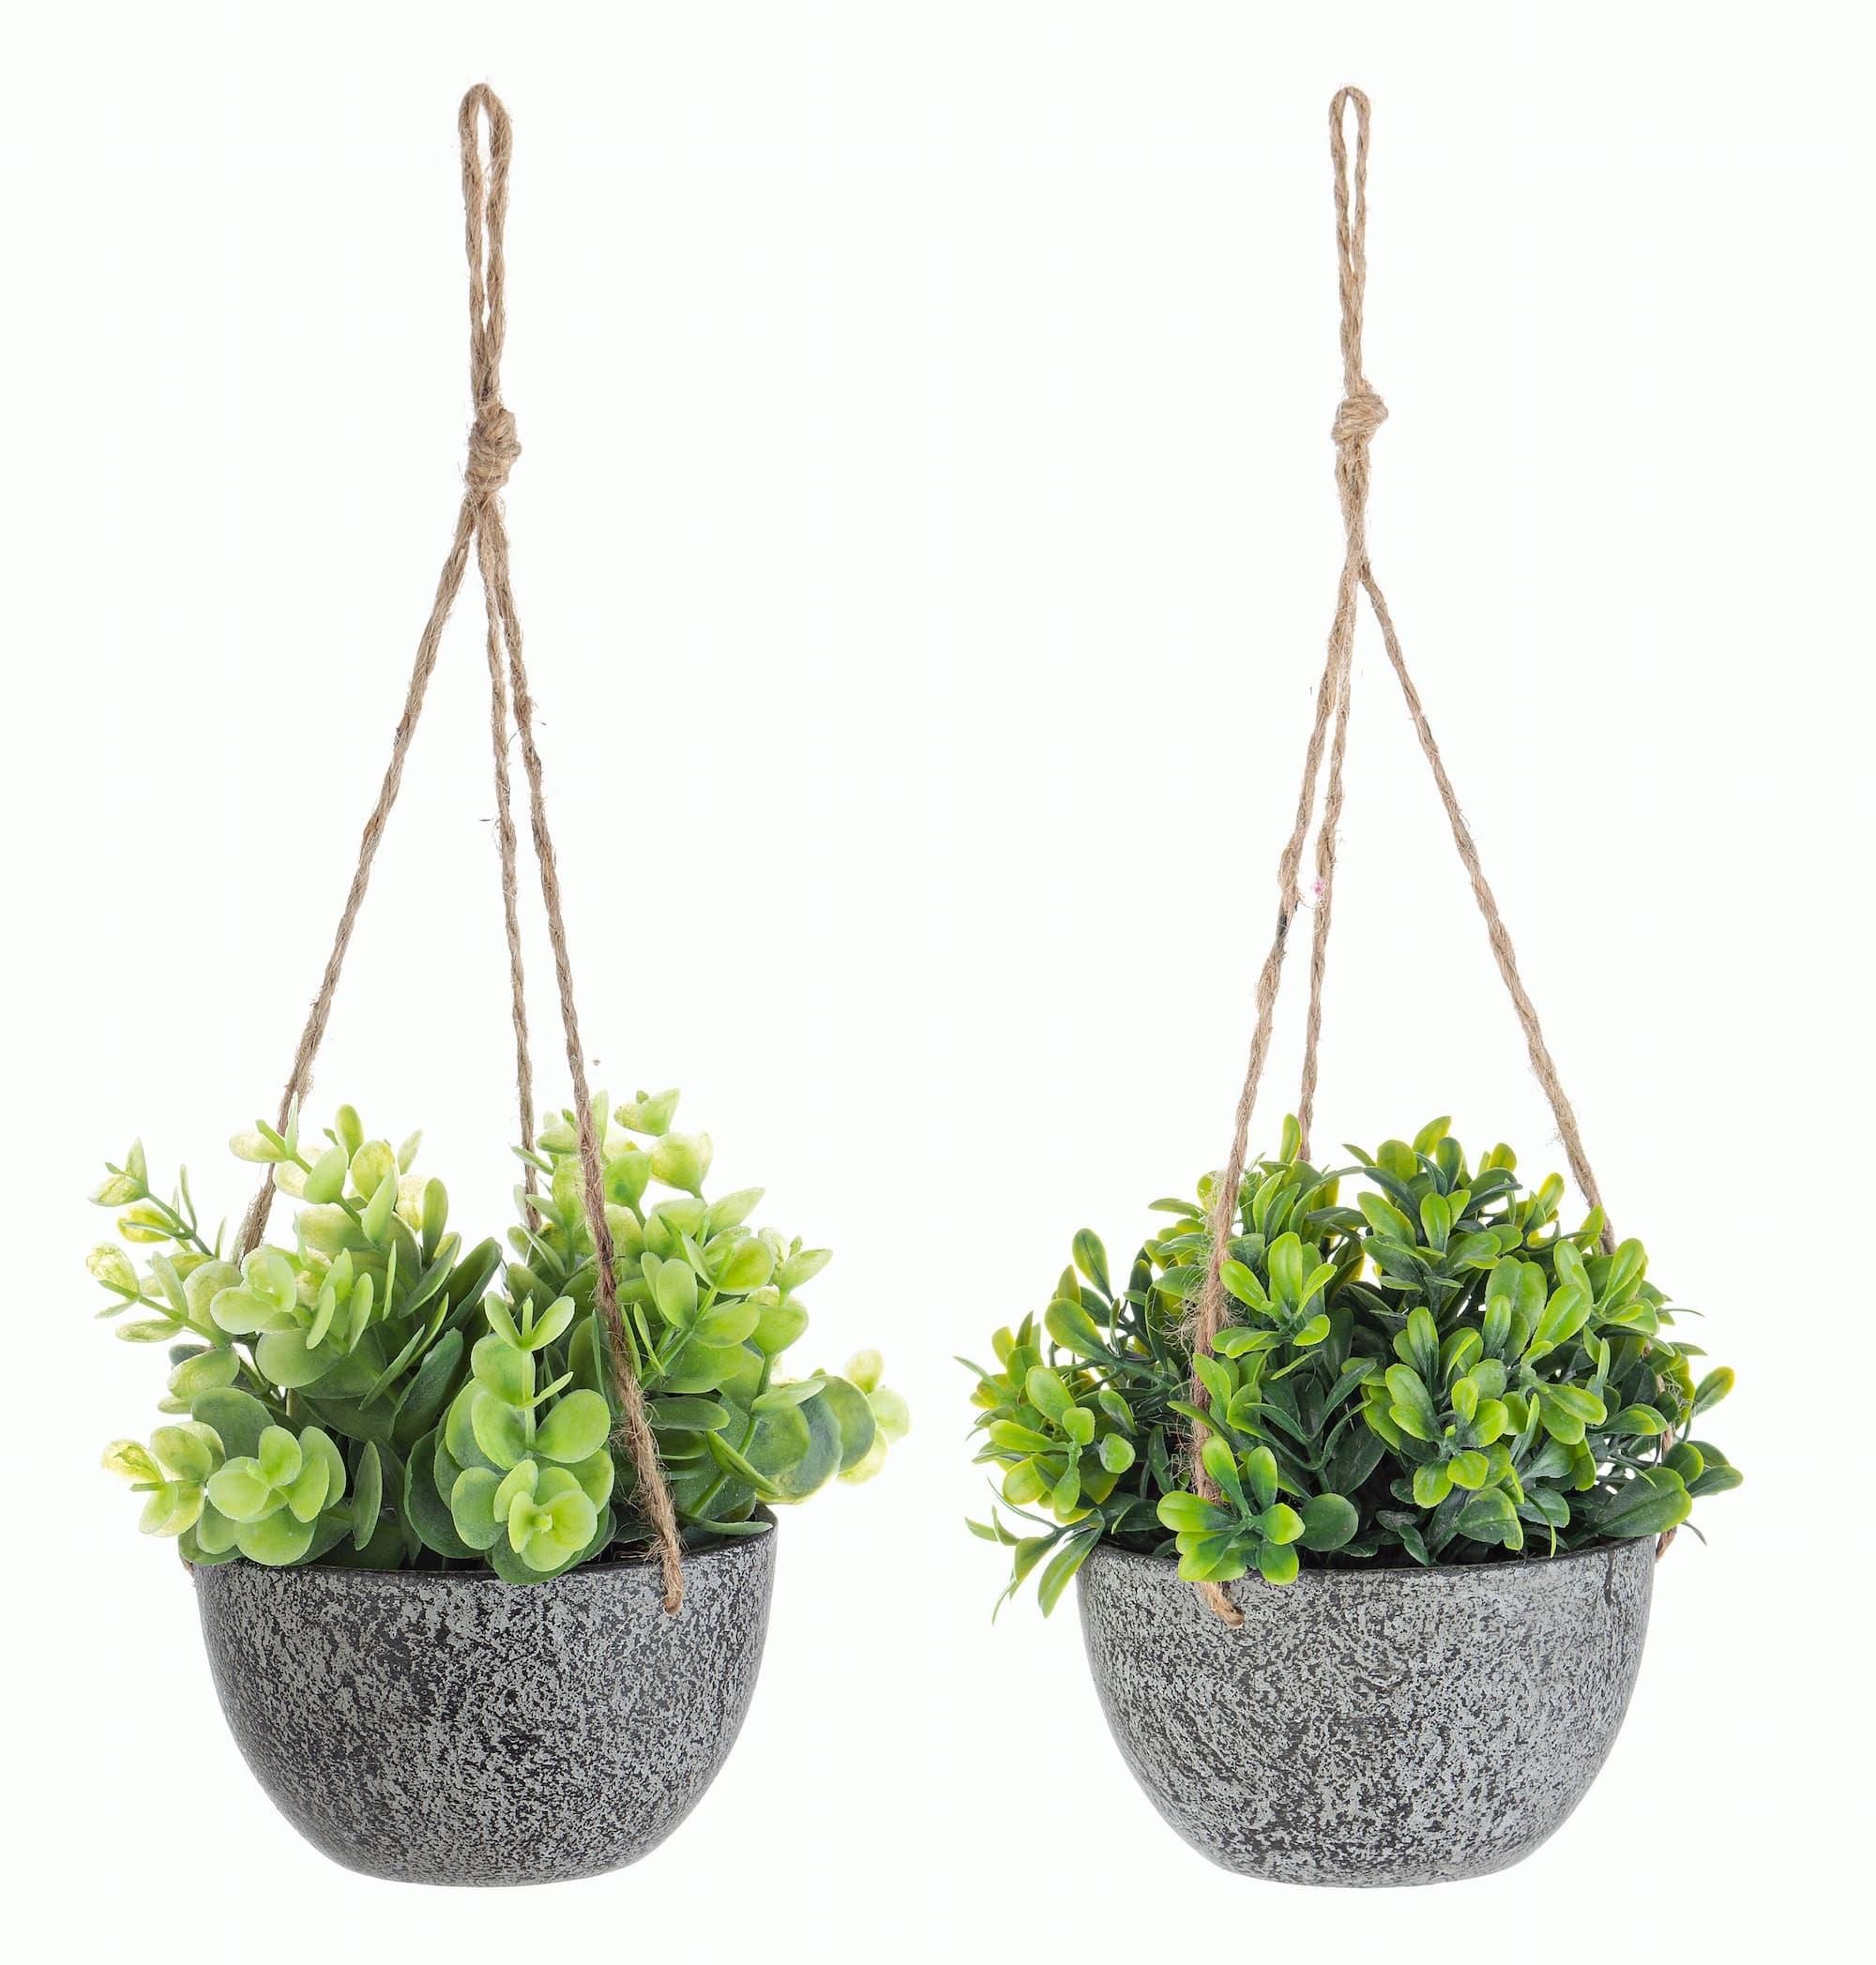 Planta artificiala in ghiveci suspendabil Pumila Verde / Gri, Modele Asortate, Ø10,5xH13 cm